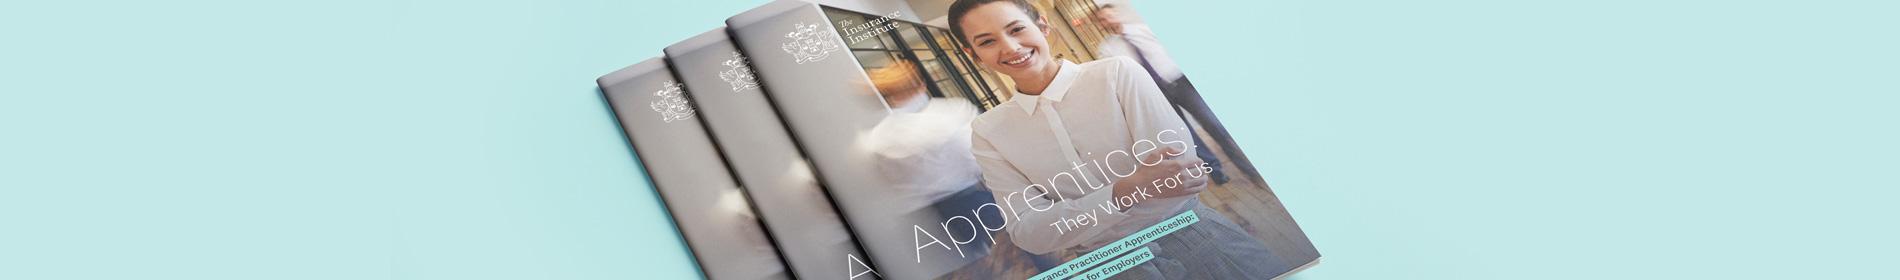 apprentices-header